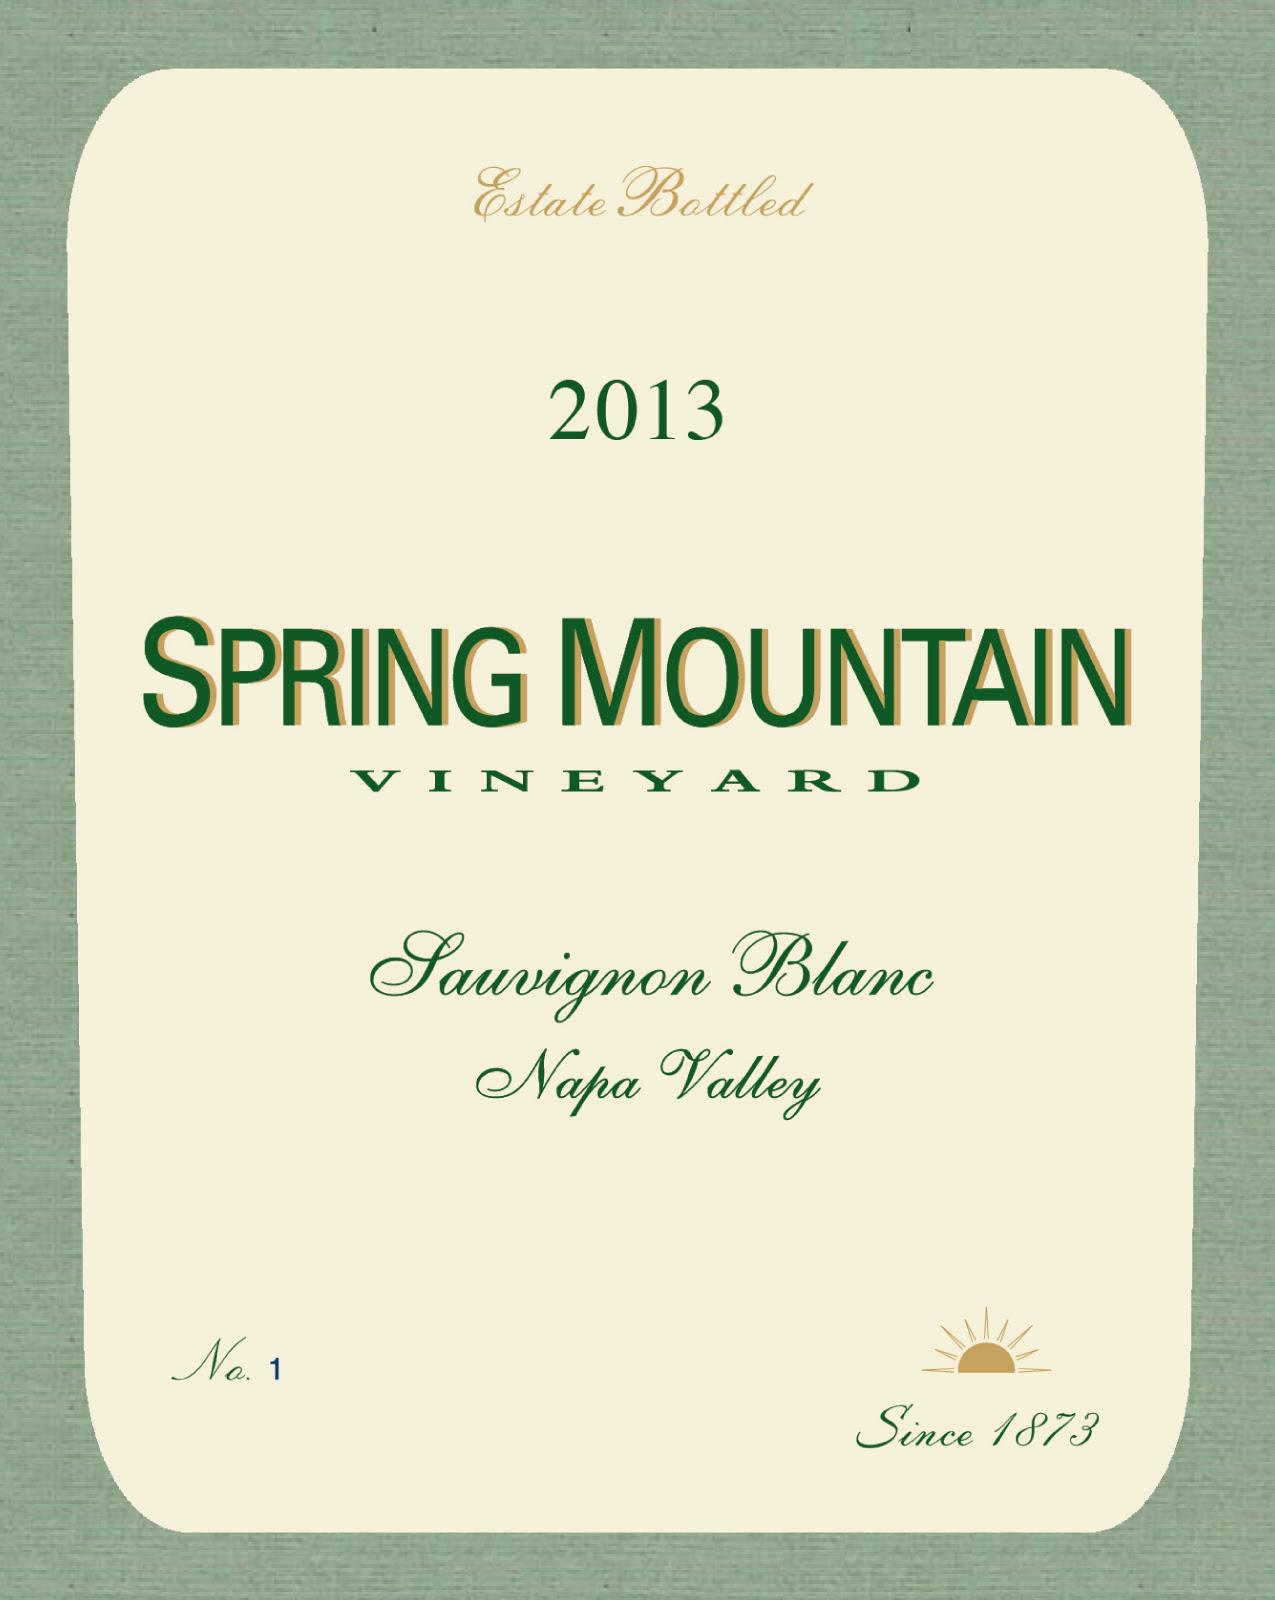 Spring Mountain Vineyard Sauvignon Blanc 2013